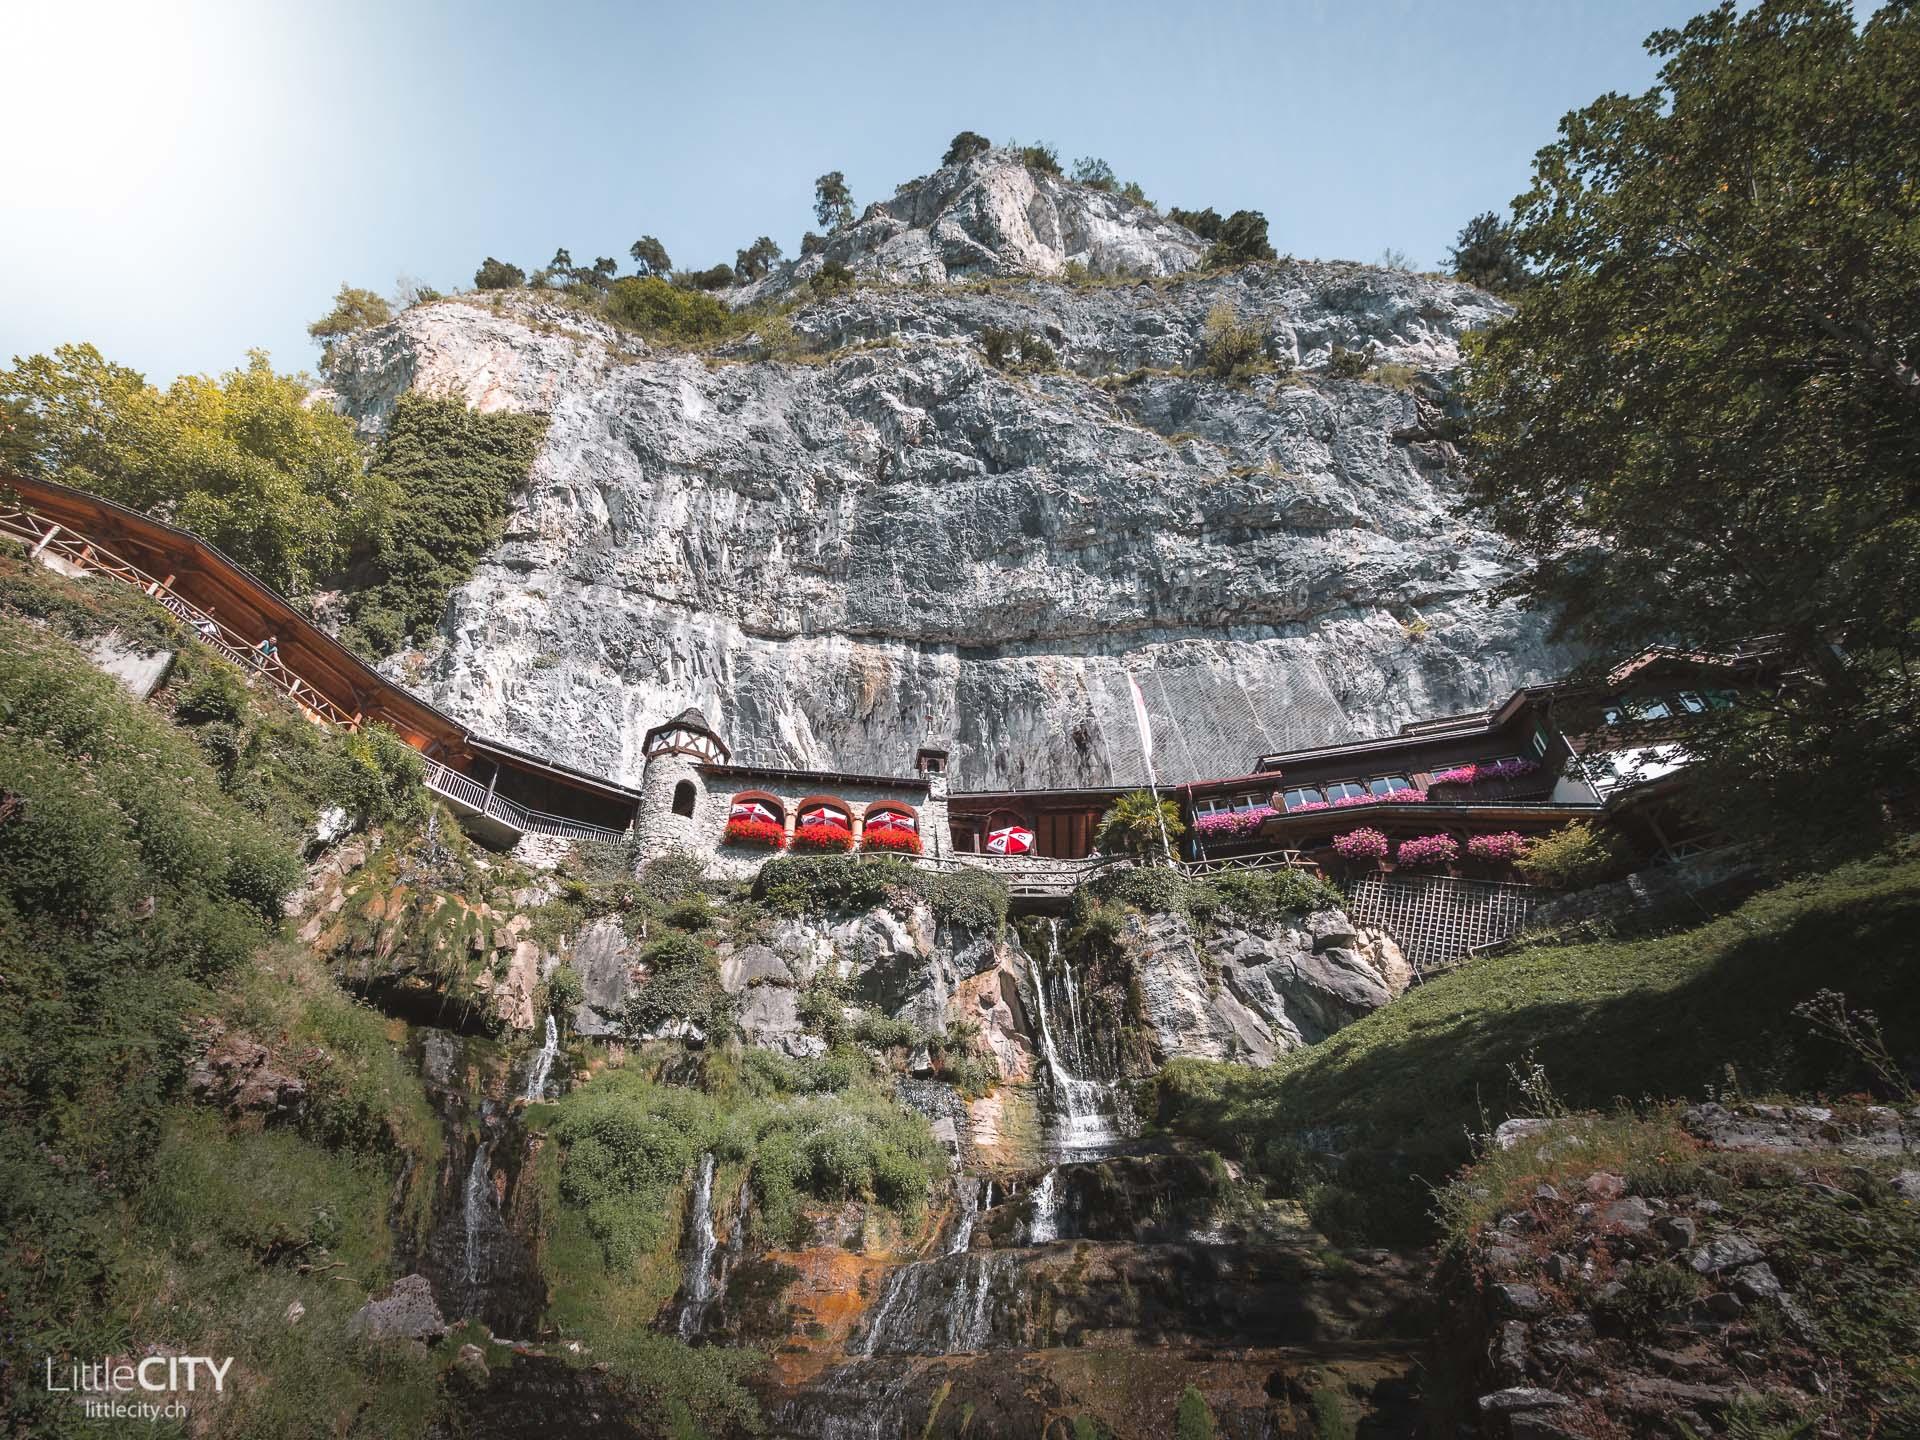 St. Beatus-Höhlen Thunersee Ausflugsziel